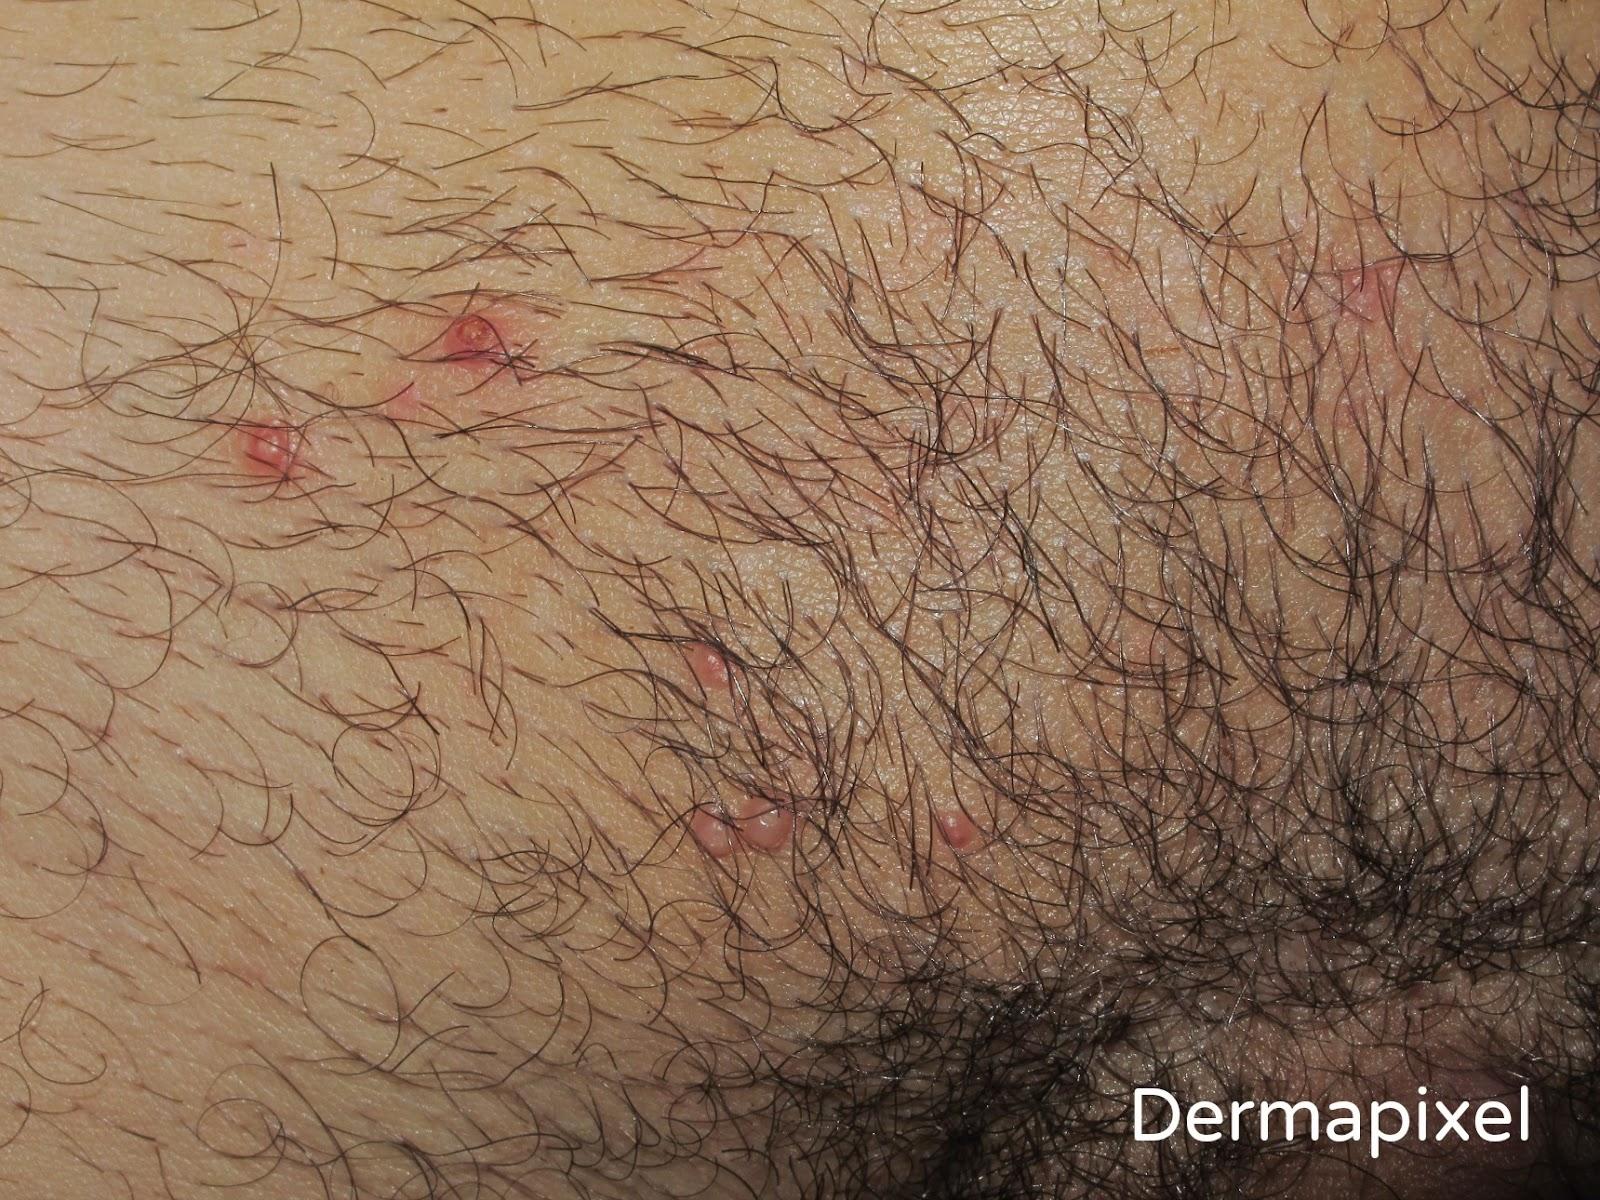 Protuberancias rojas en la vagina externa